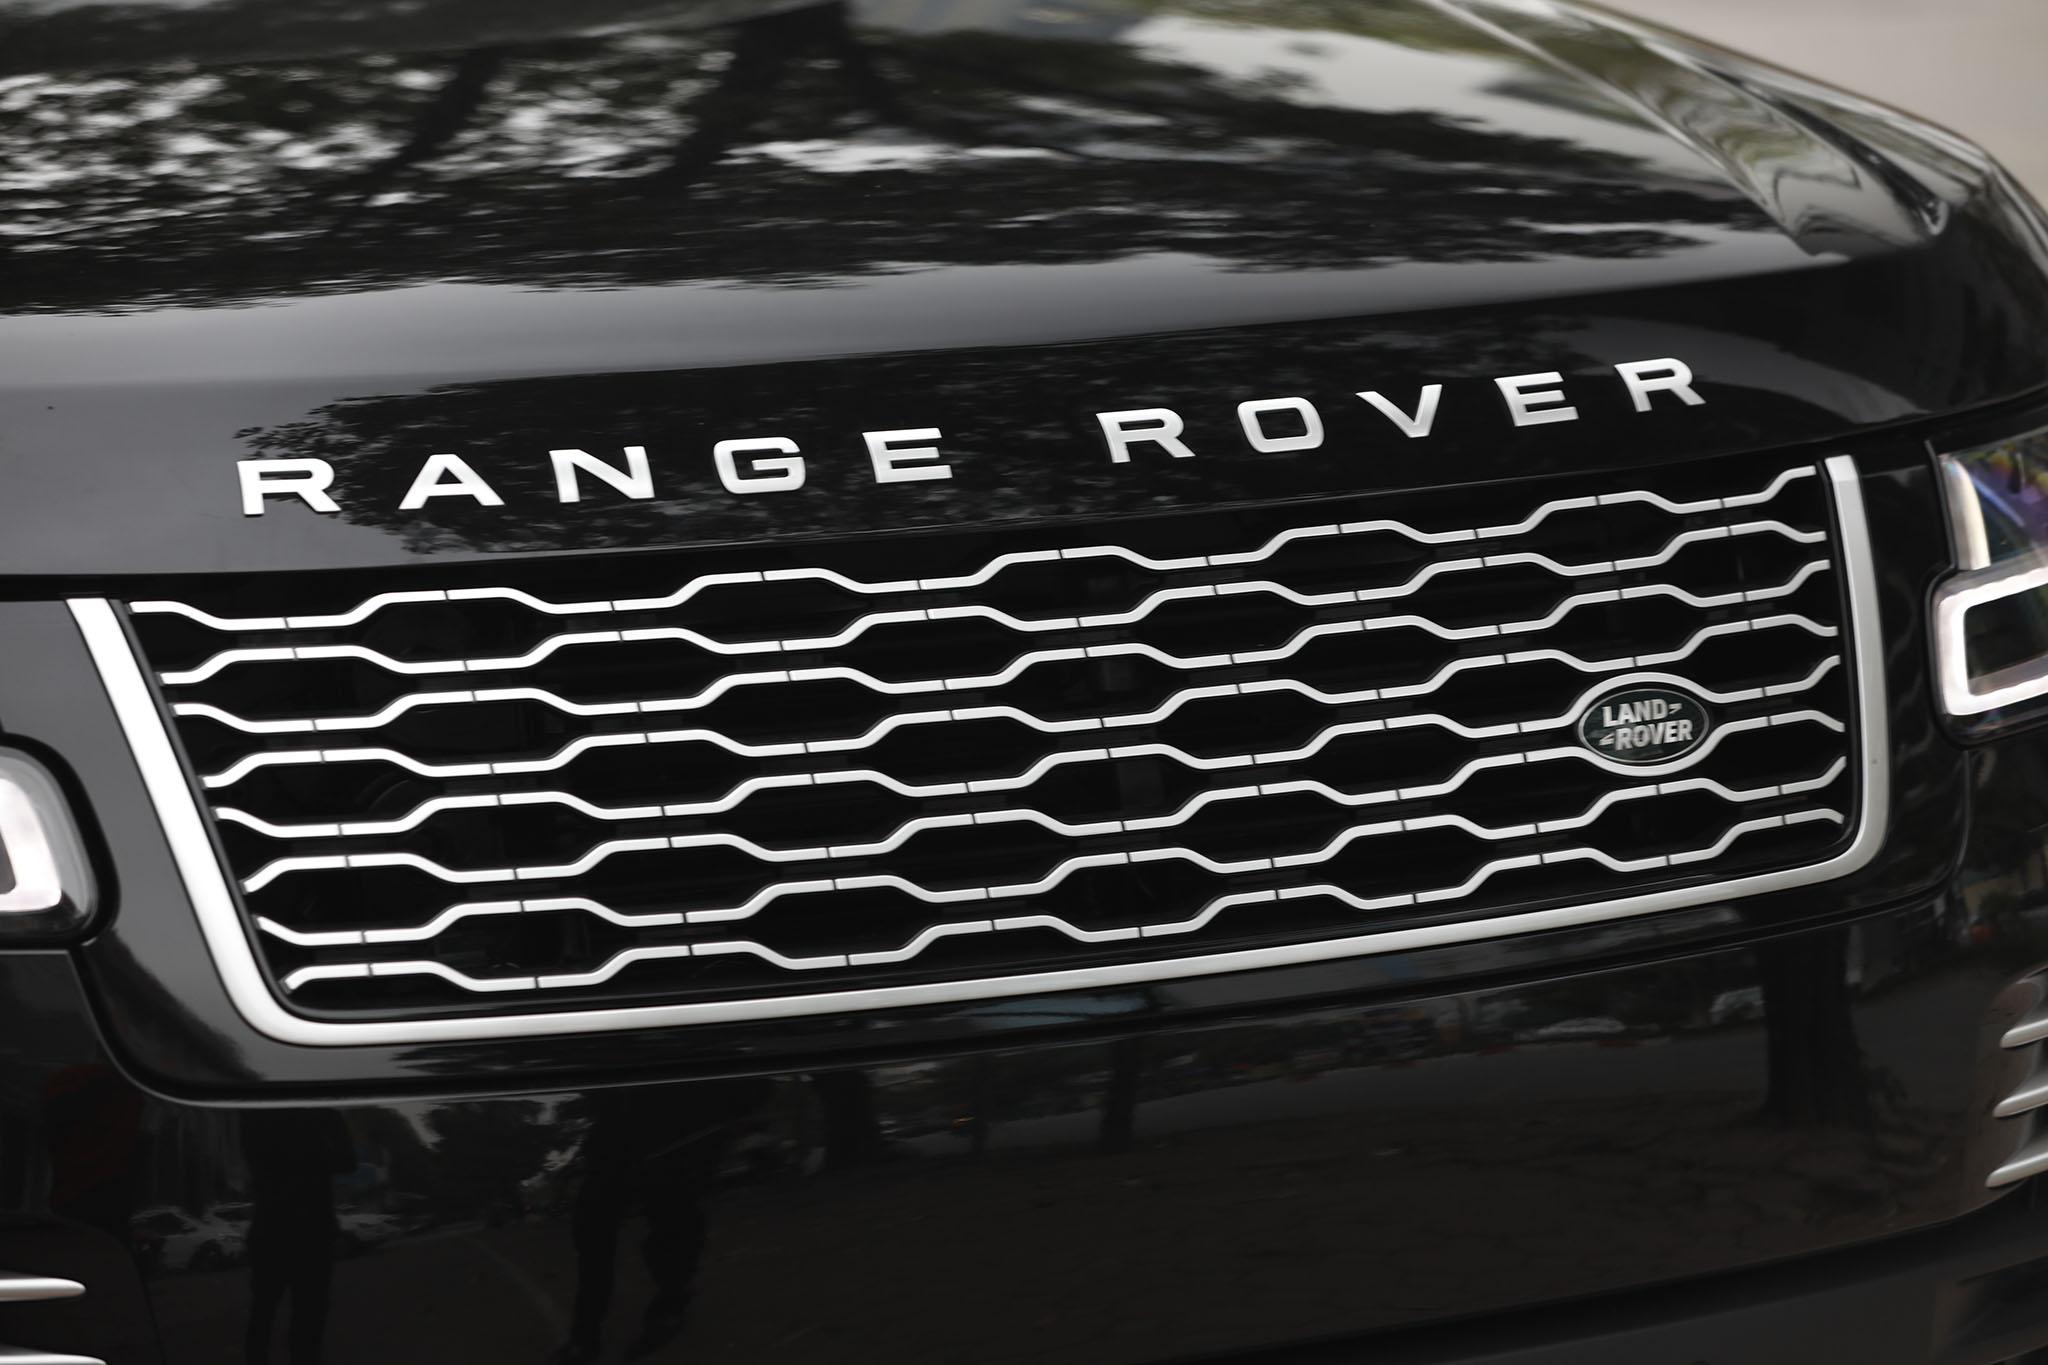 RANGEROVER LAND ROVER AUTOBIOGRAPHY LWB P400 2021